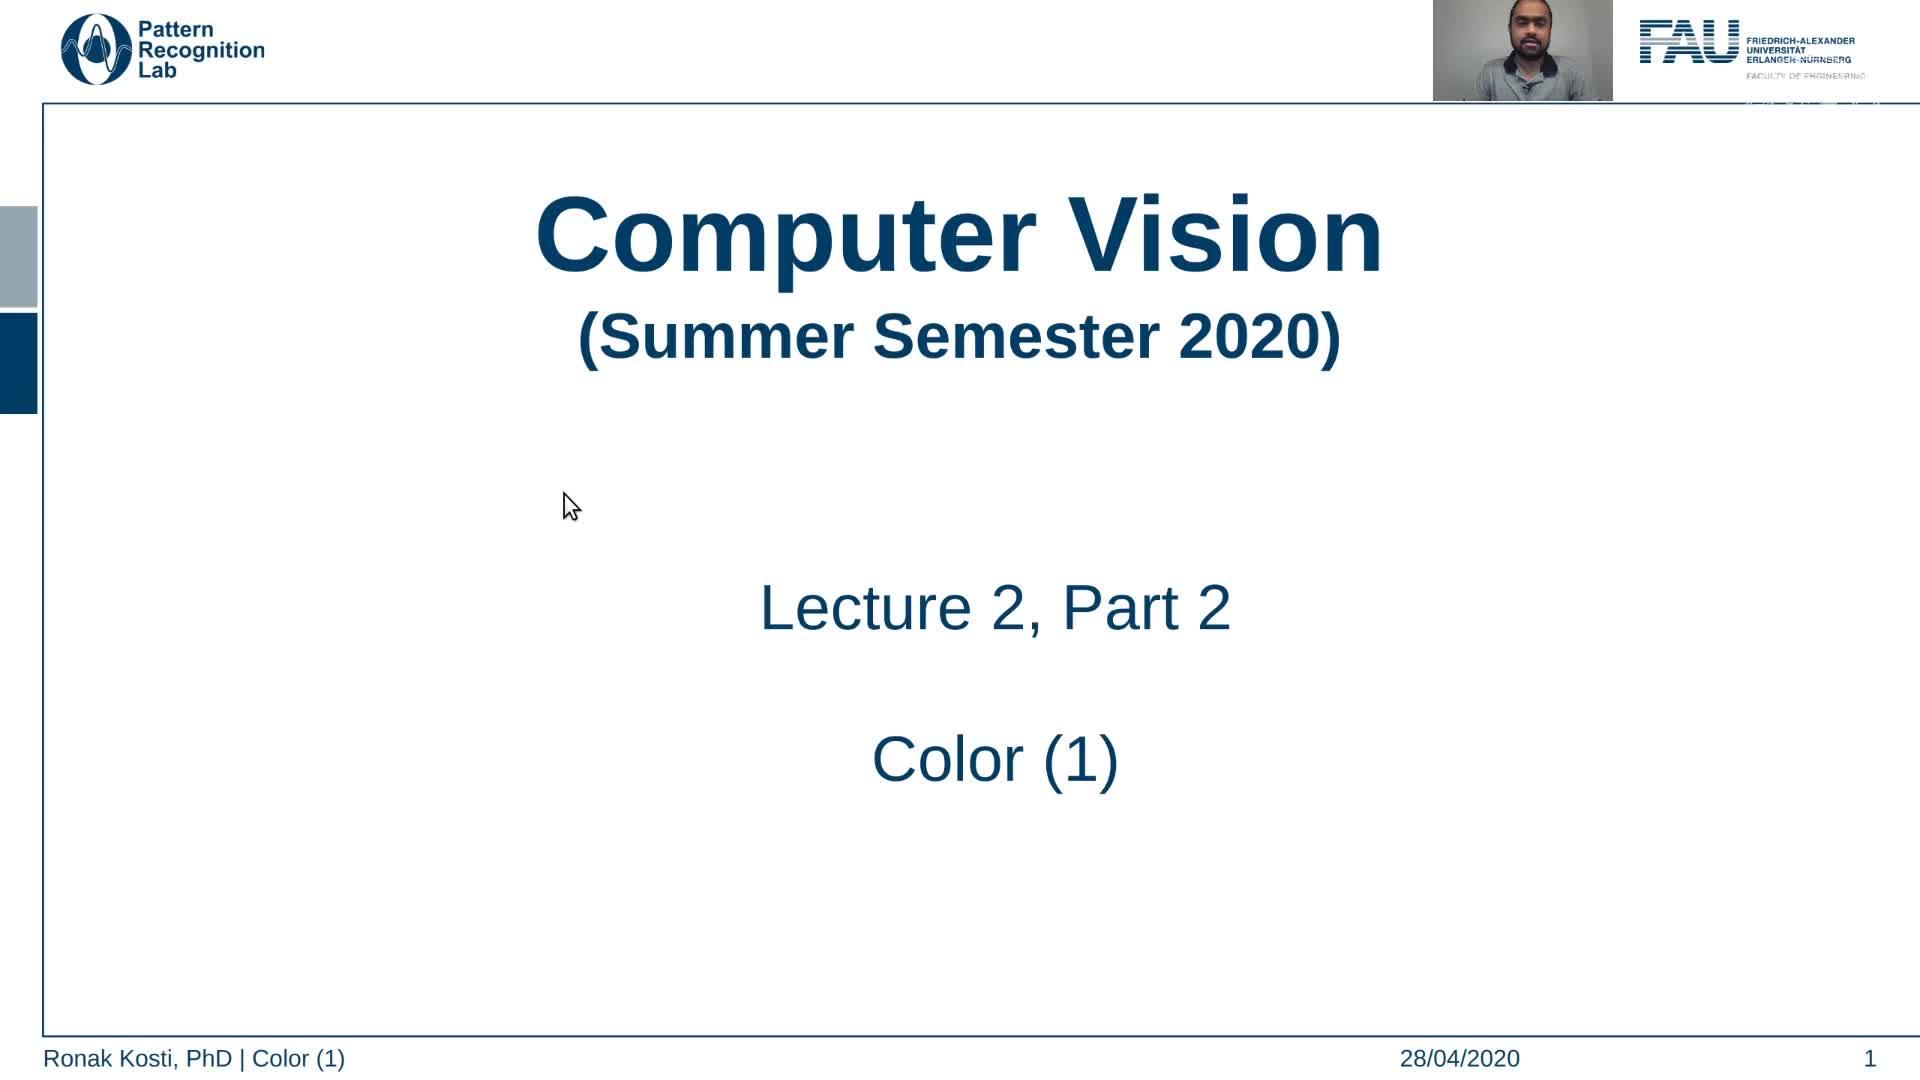 Colors (Lecture 2, Part 2) preview image